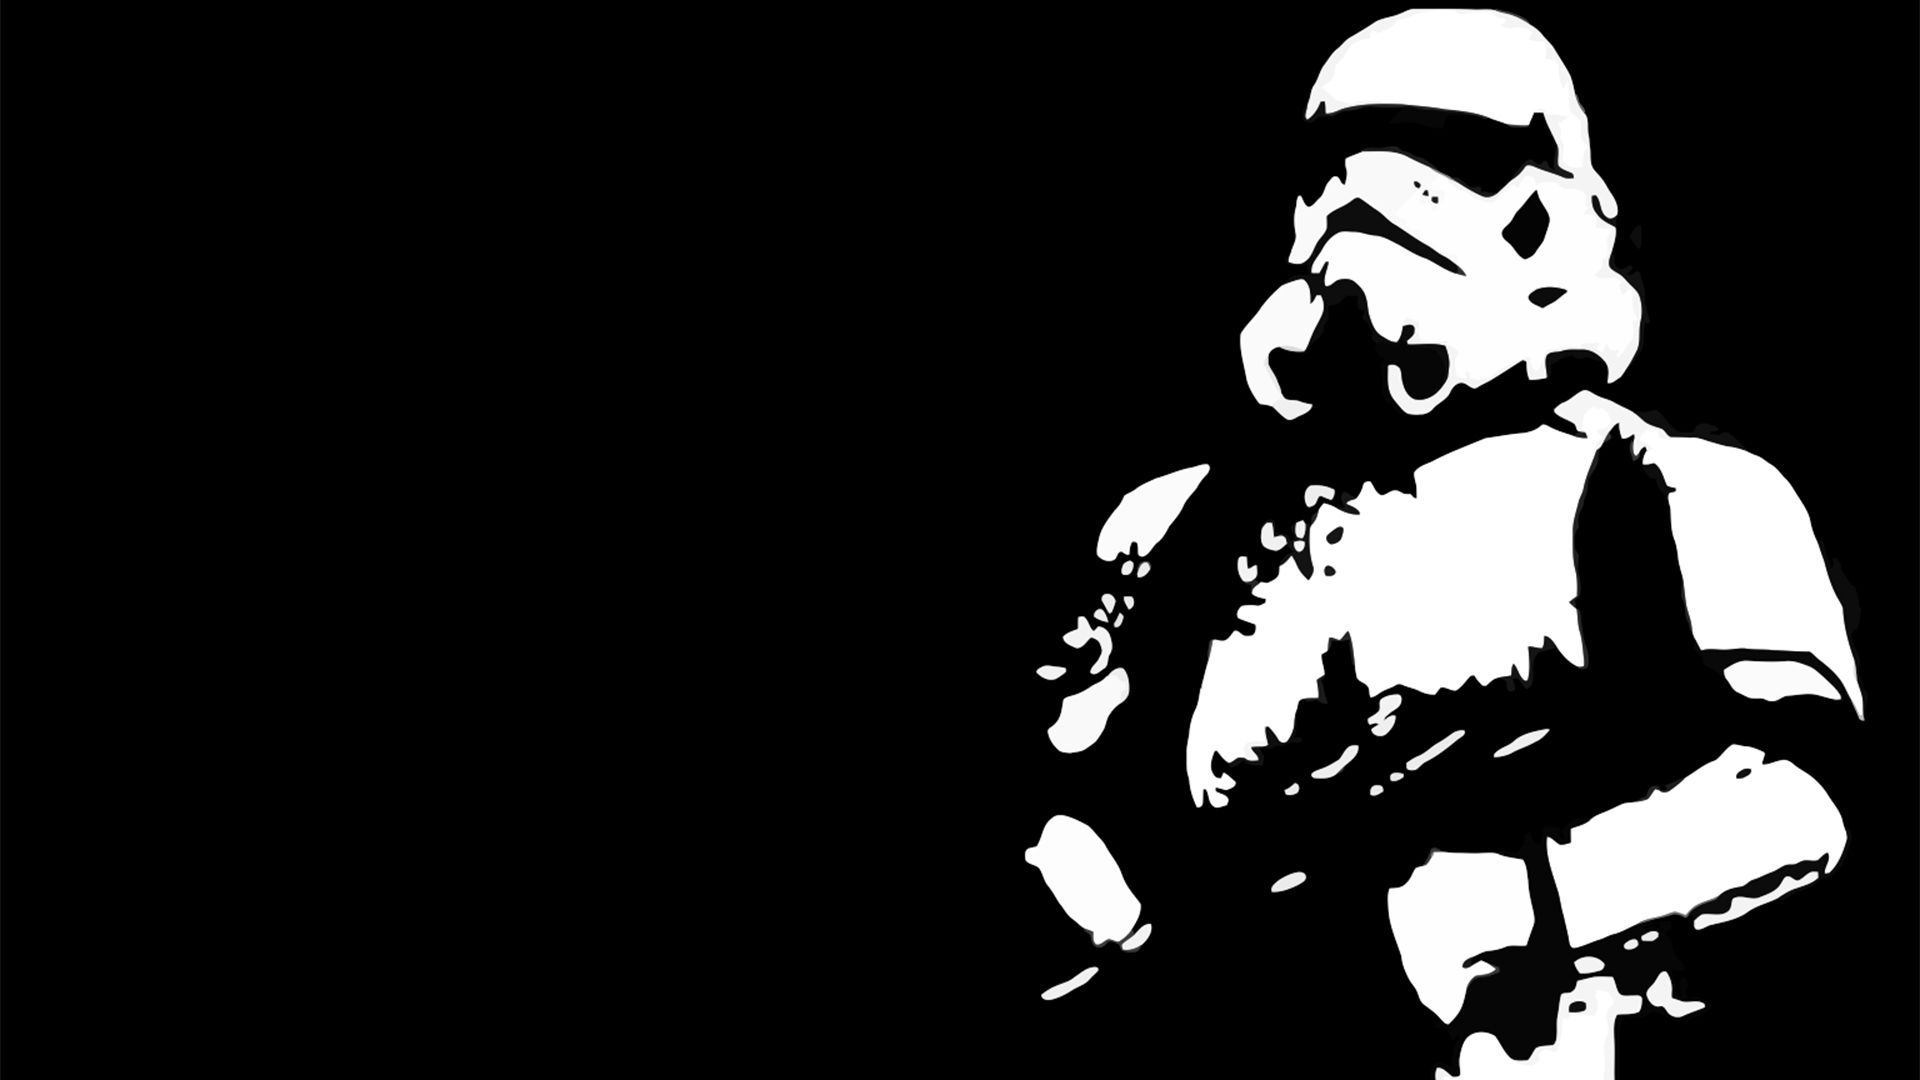 Star Wars Stormtrooper Wallpapers 1920x1080